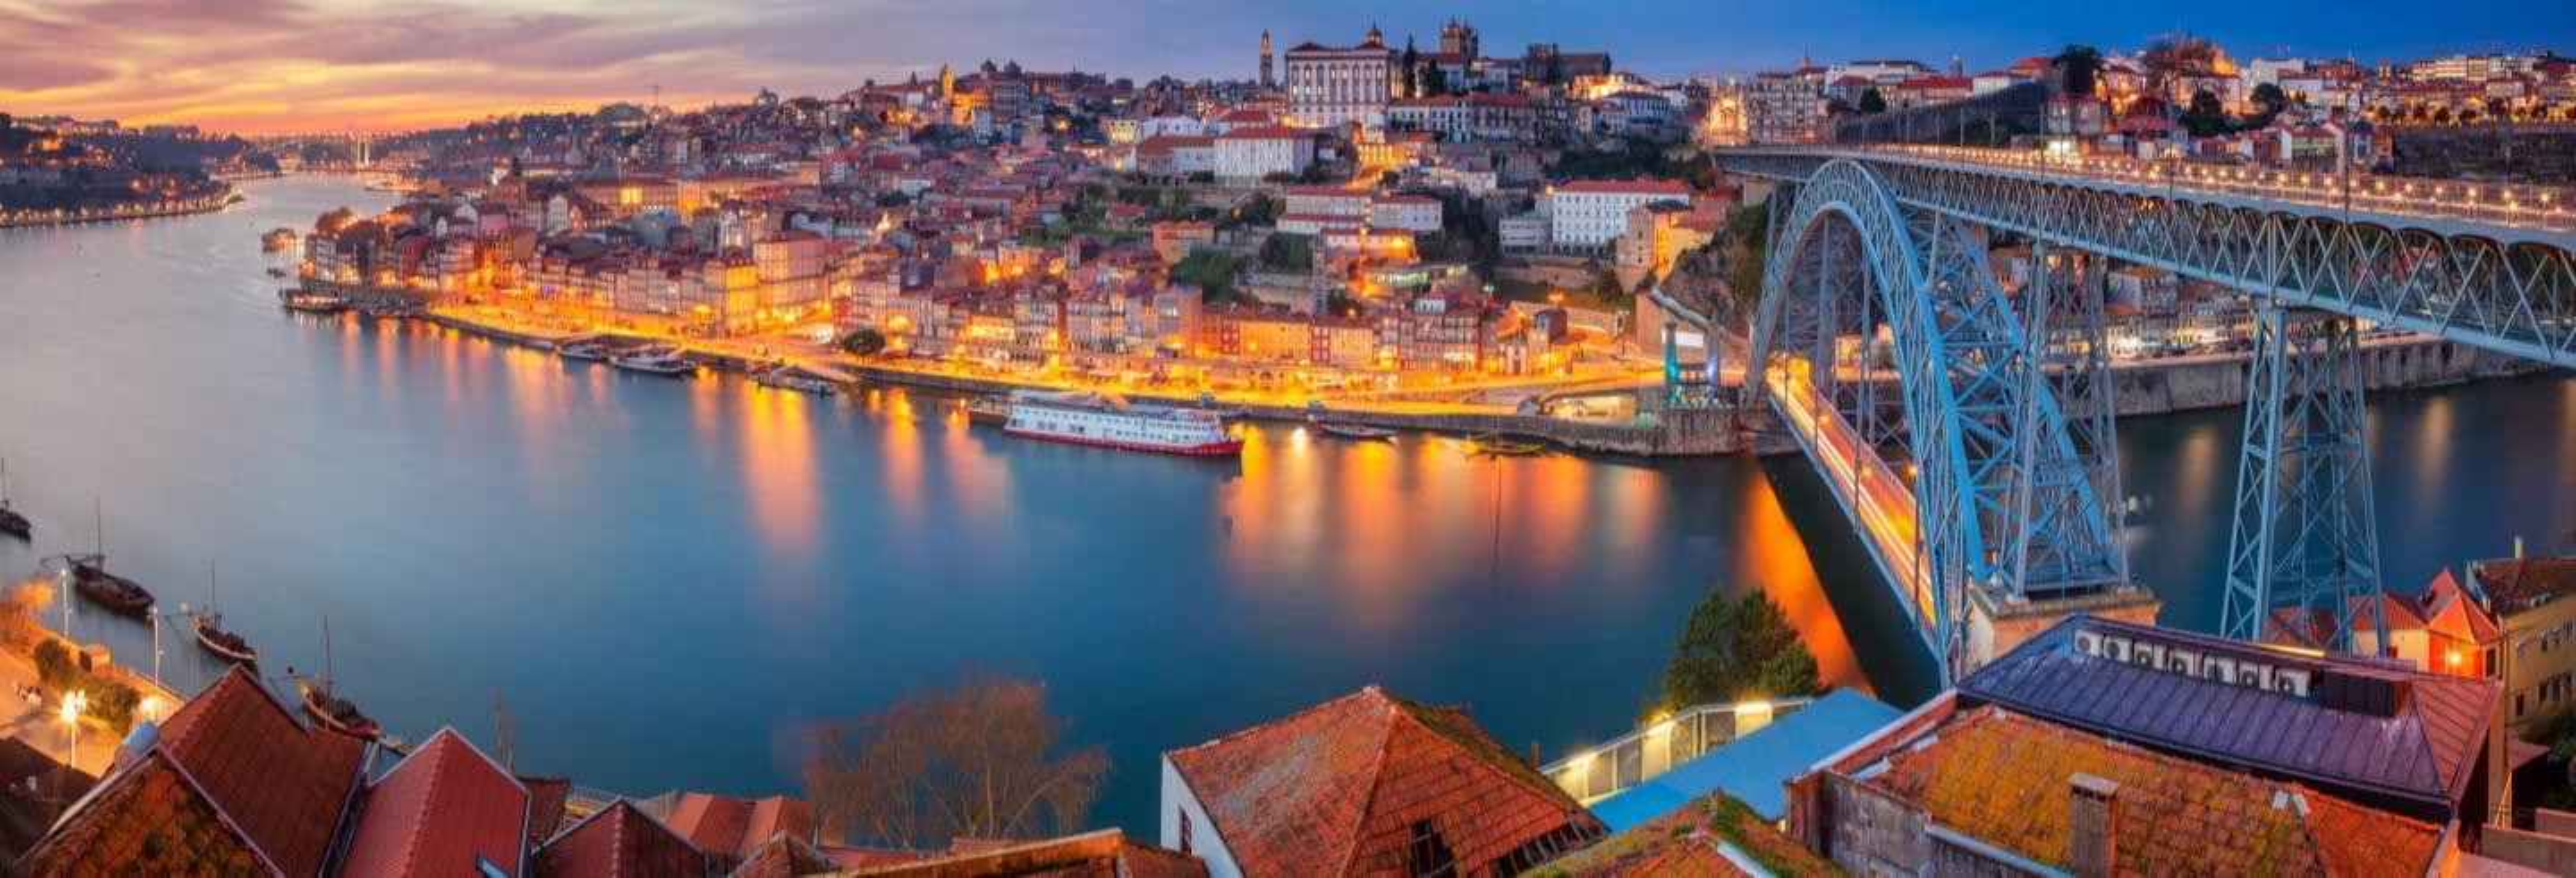 Tour nocturno por Oporto